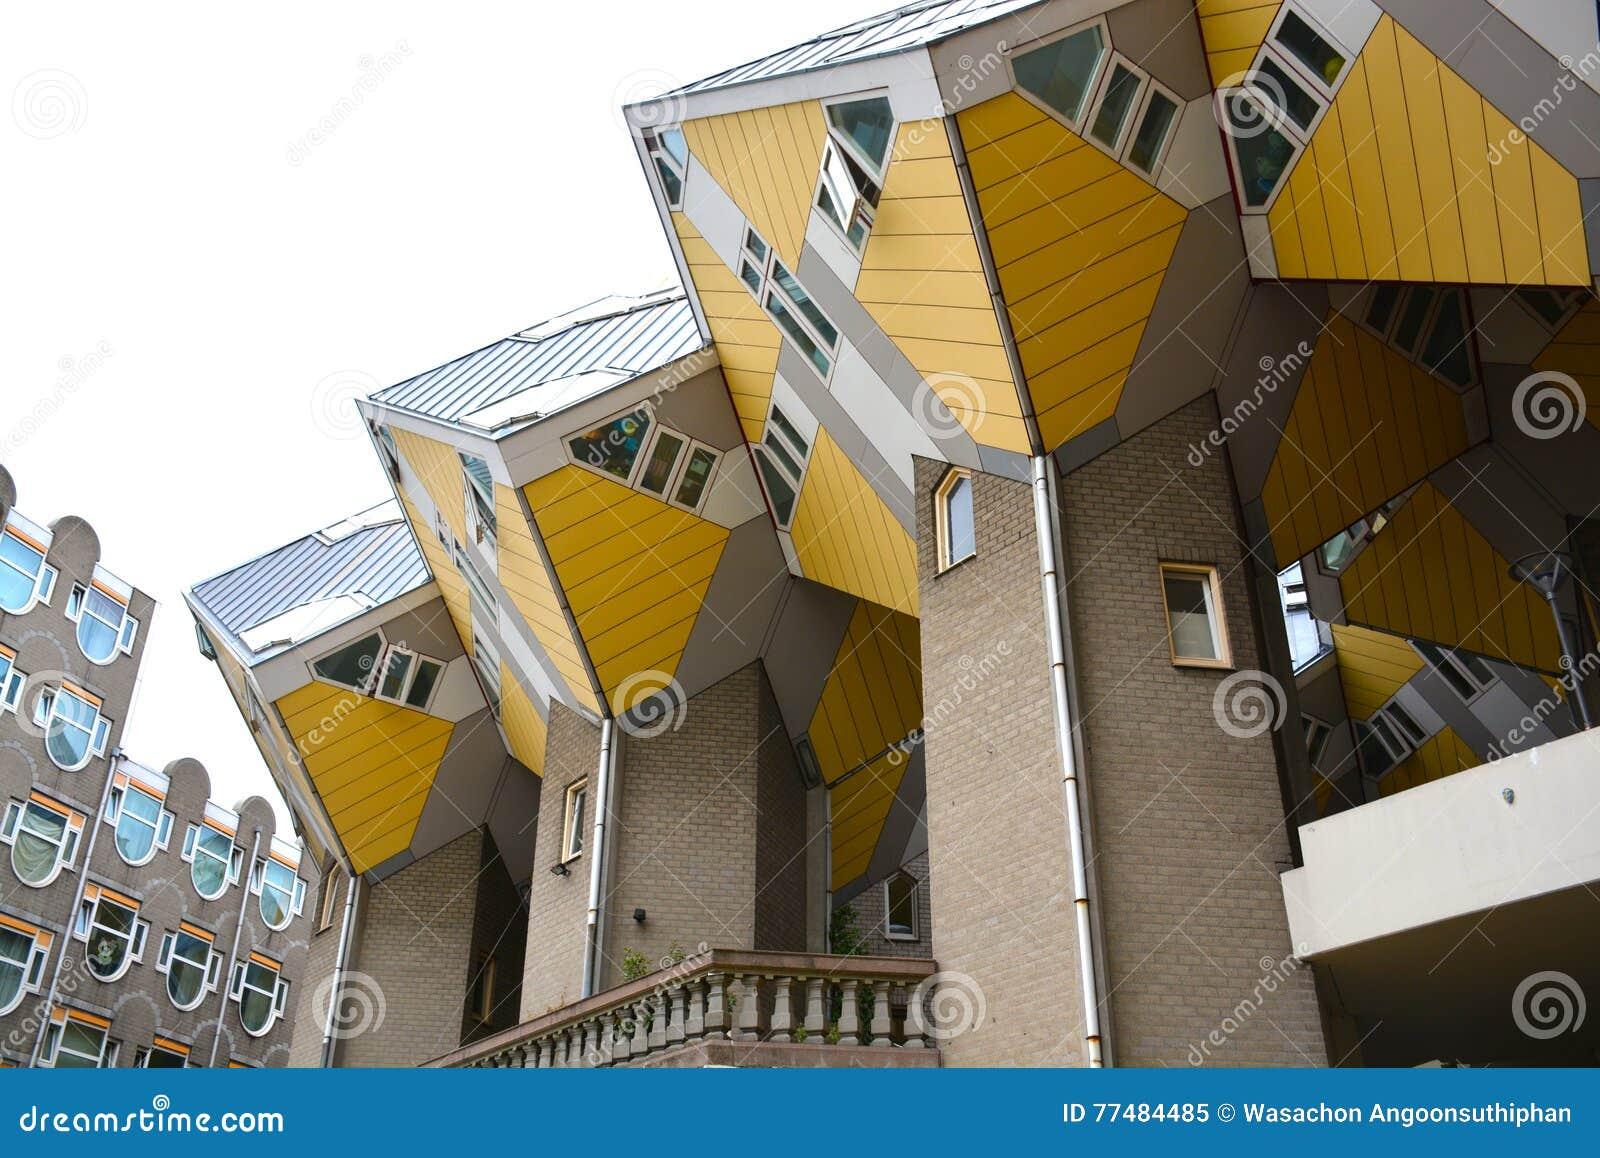 Cube House, Rotterdam, Netherlands - 11 Aug 2015